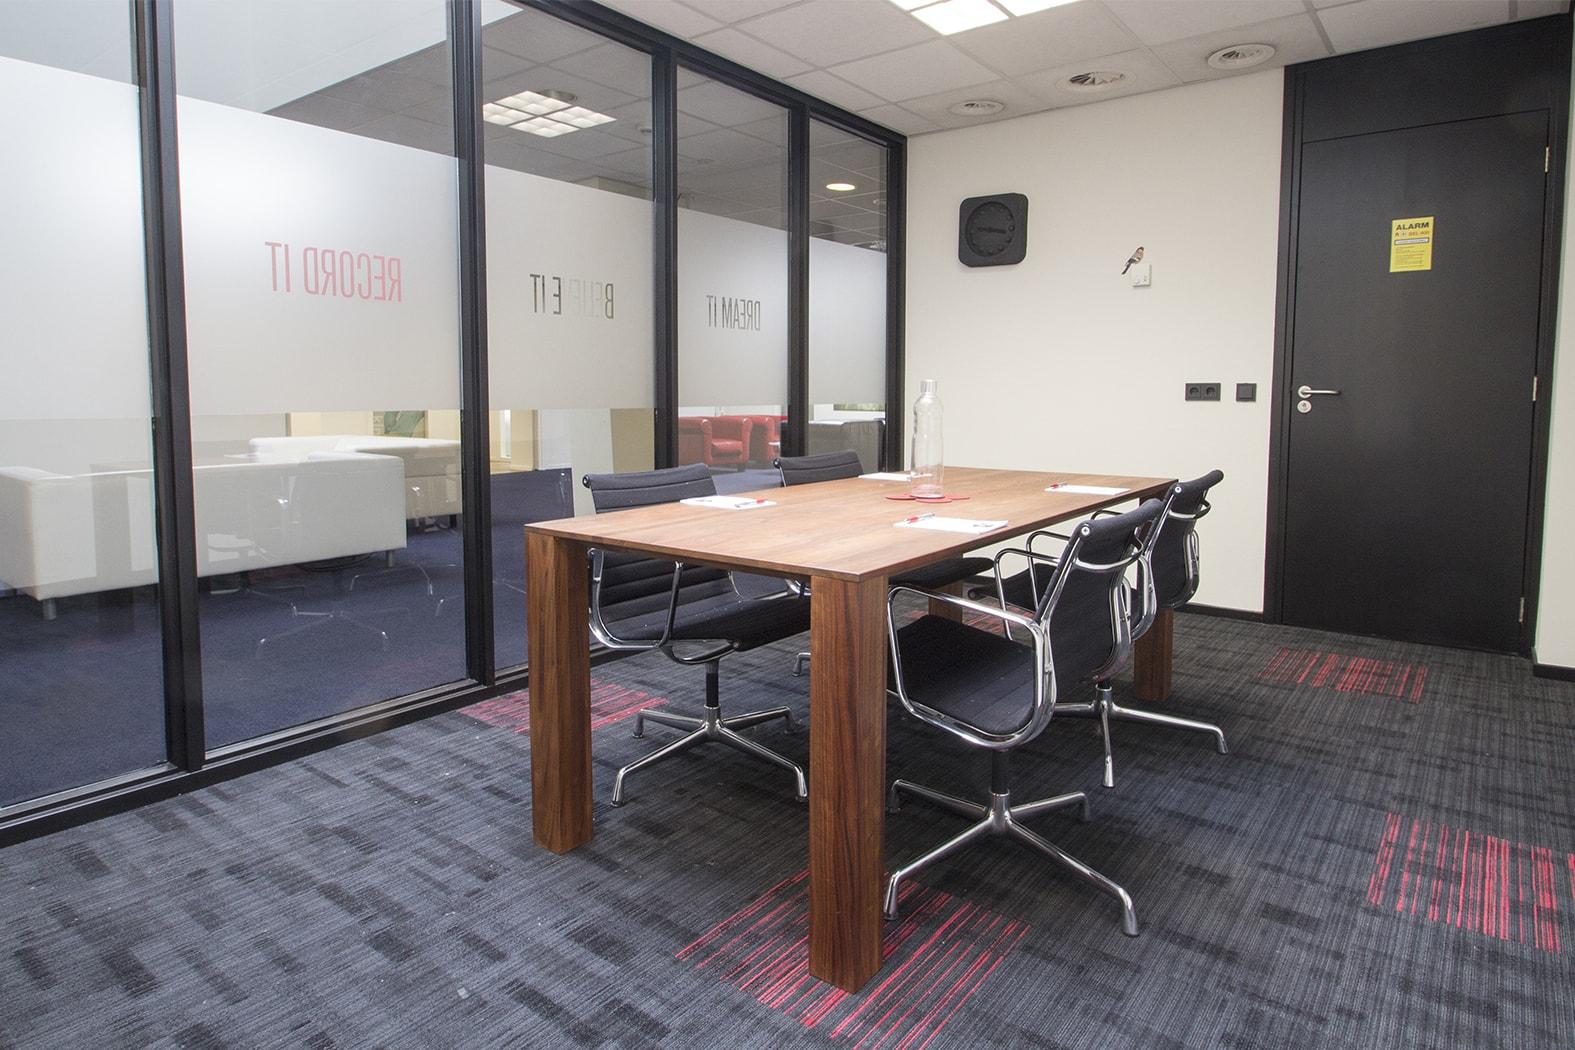 Vergadering in Aalsmeer | Crown Business Center Aalsmeer